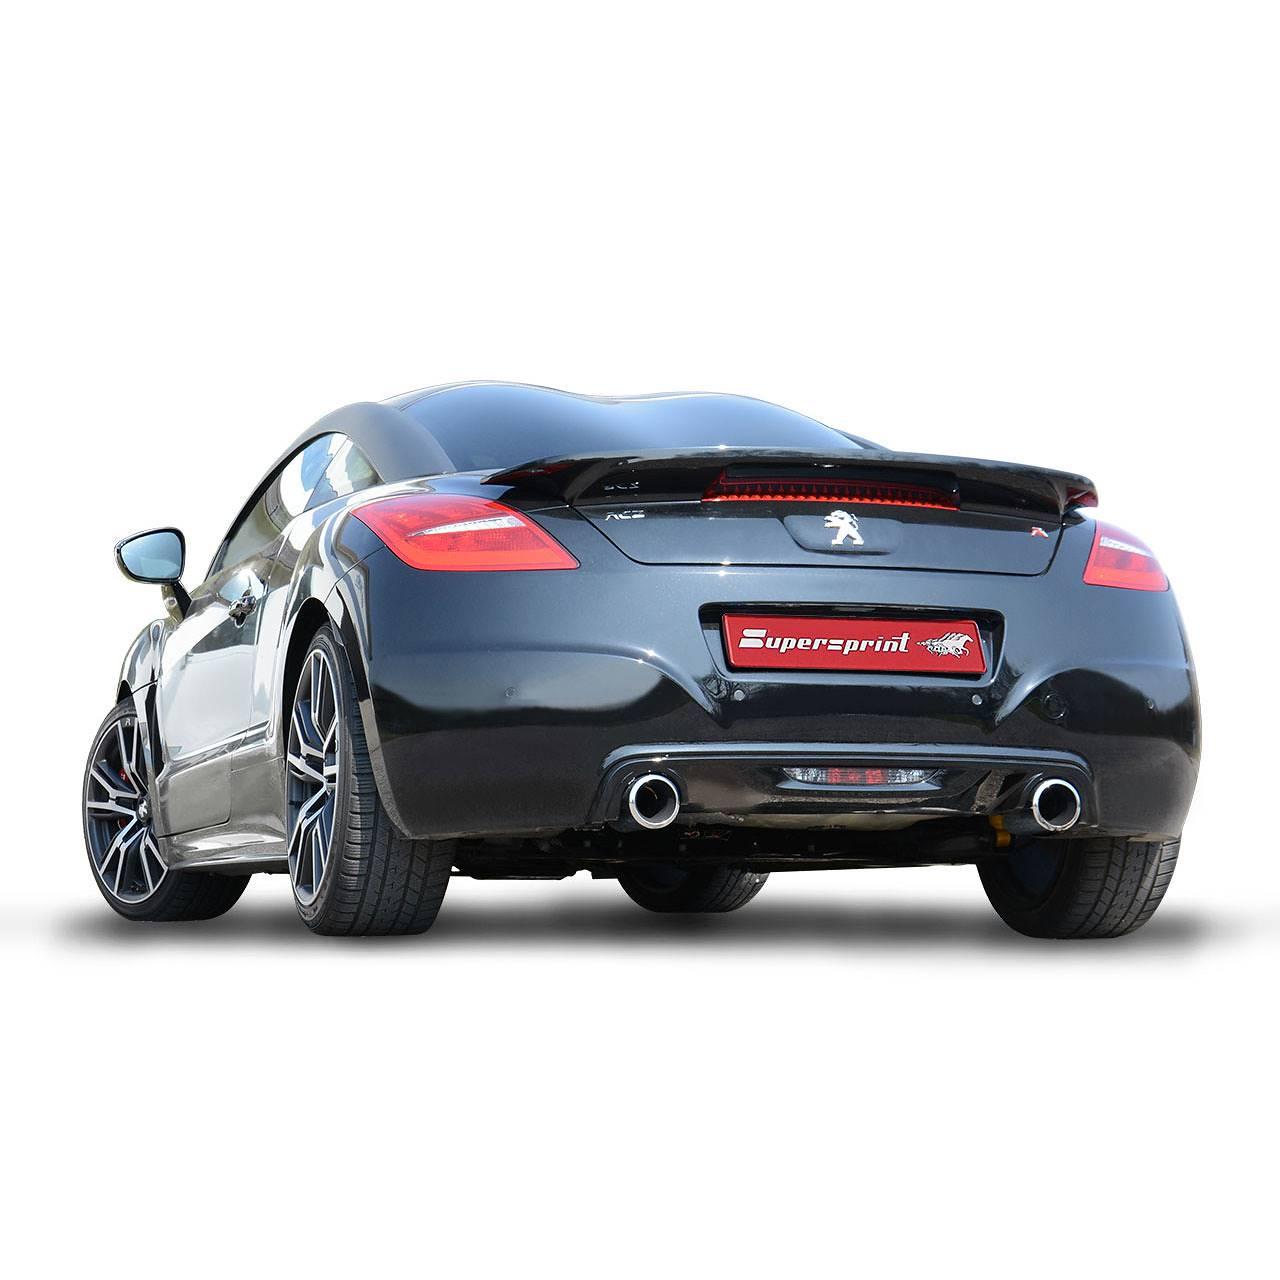 peugeot rcz r 1 6t 270 hp 2013 u003e 2015 peugeot exhaust systems rh supersprint com Peugeot RCZ Black and White peugeot rcz user manual pdf